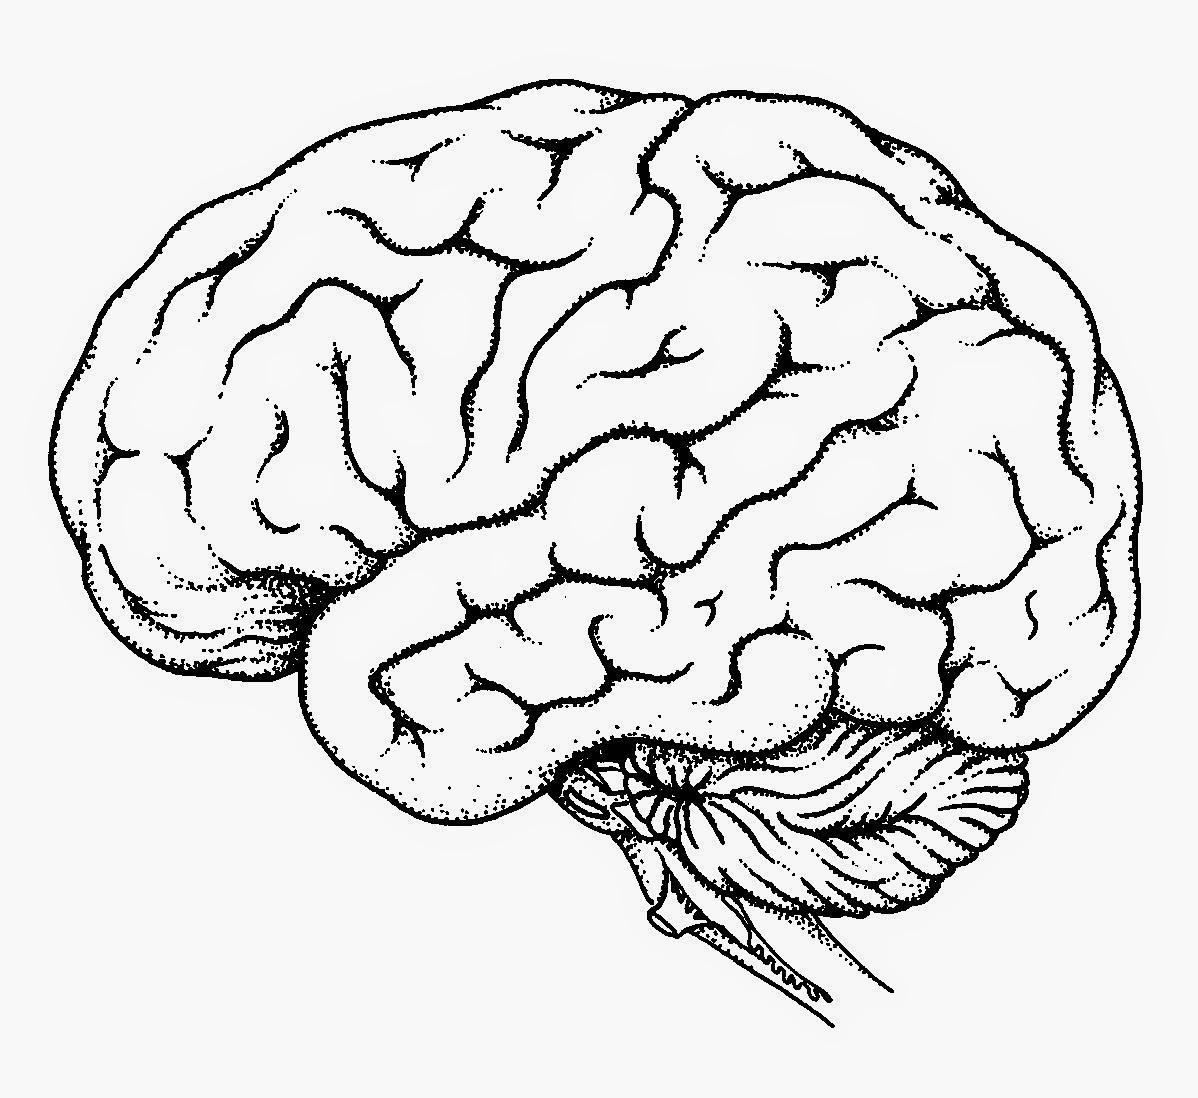 Brain Outline Drawing At Getdrawings